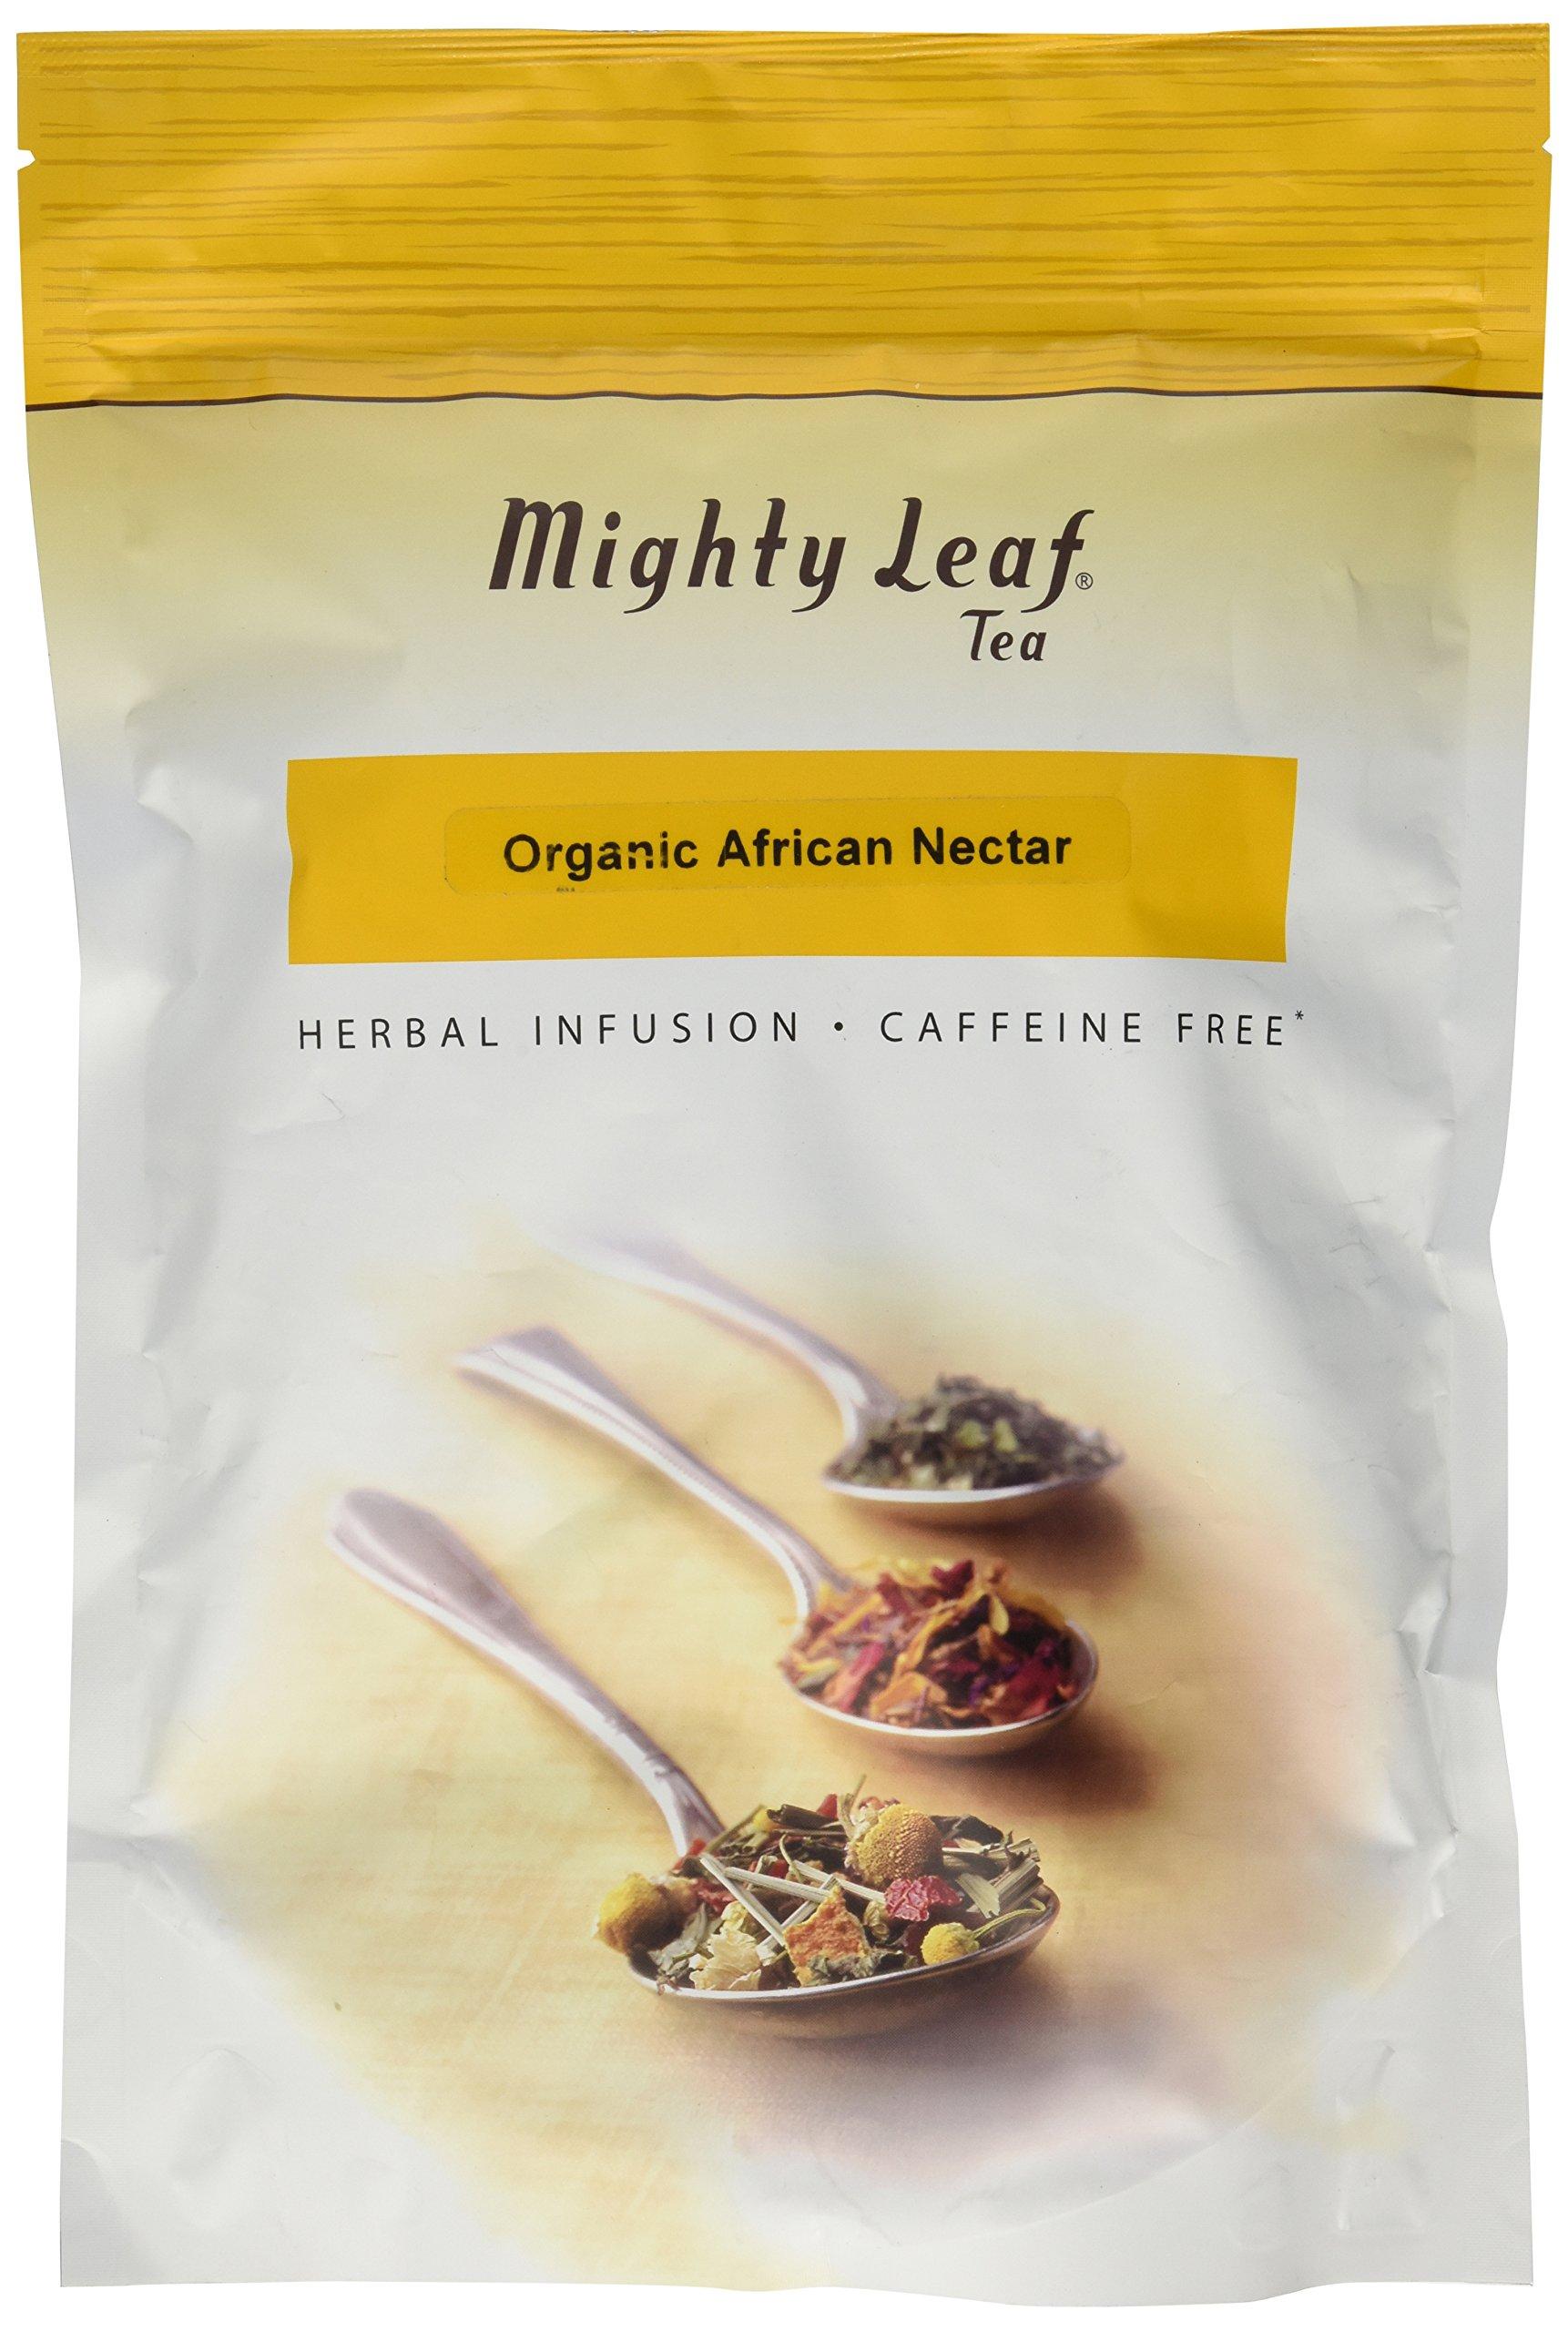 Mighty Leaf Organic African Nectar 1lb Loose Tea